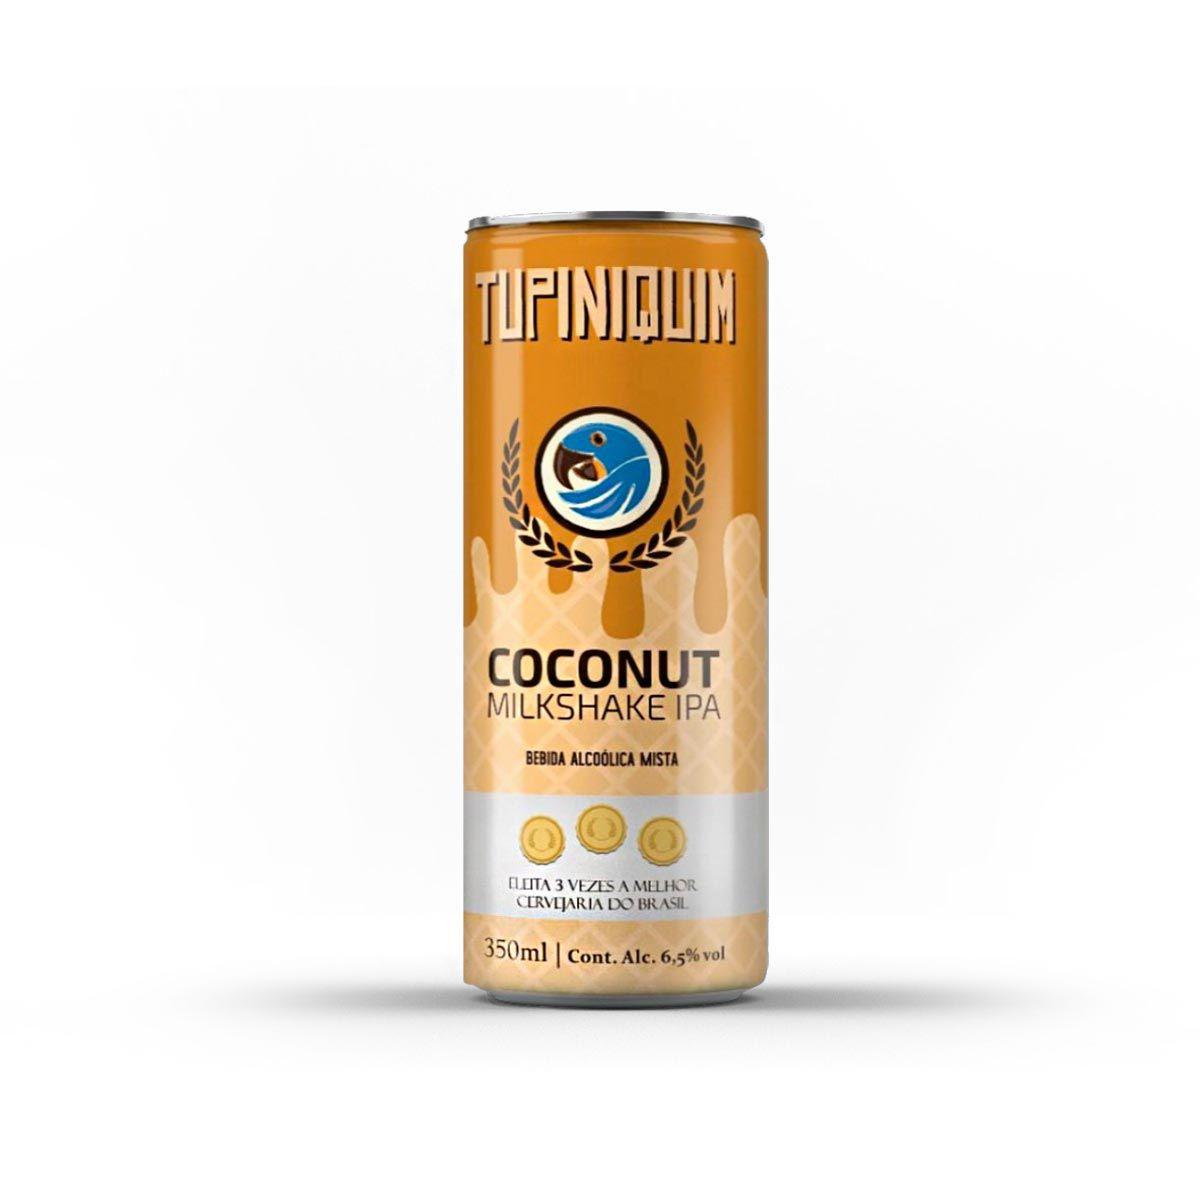 Tupiniquim Coconut Milkshake IPA 350ml